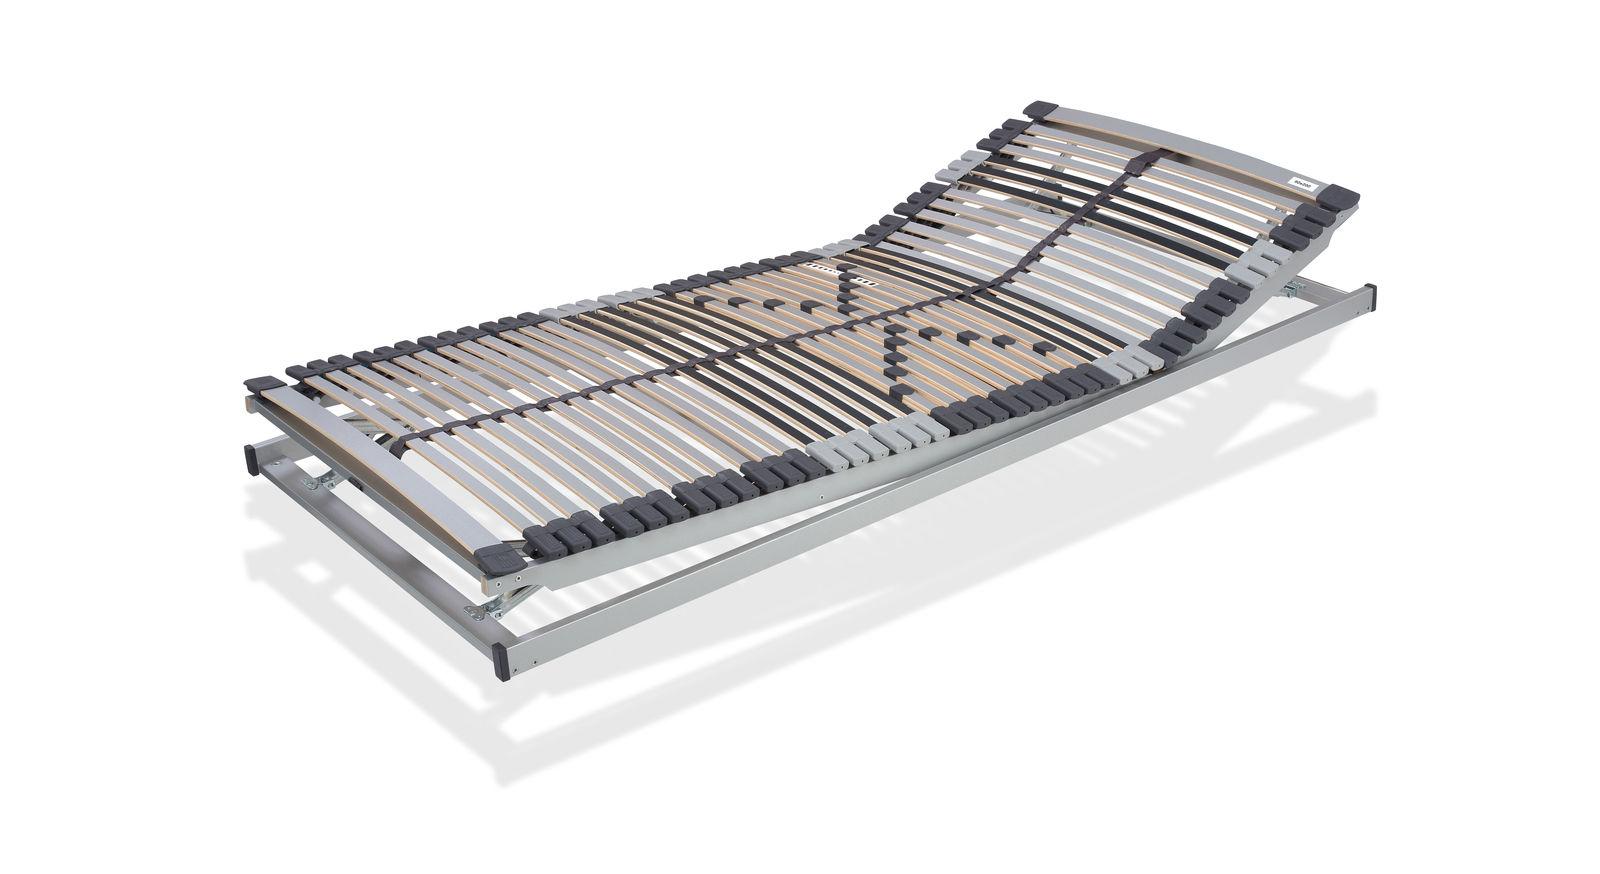 Hochwertiger MALIE-Lattenrost Classic Superflex 42 mit 7-Zonen